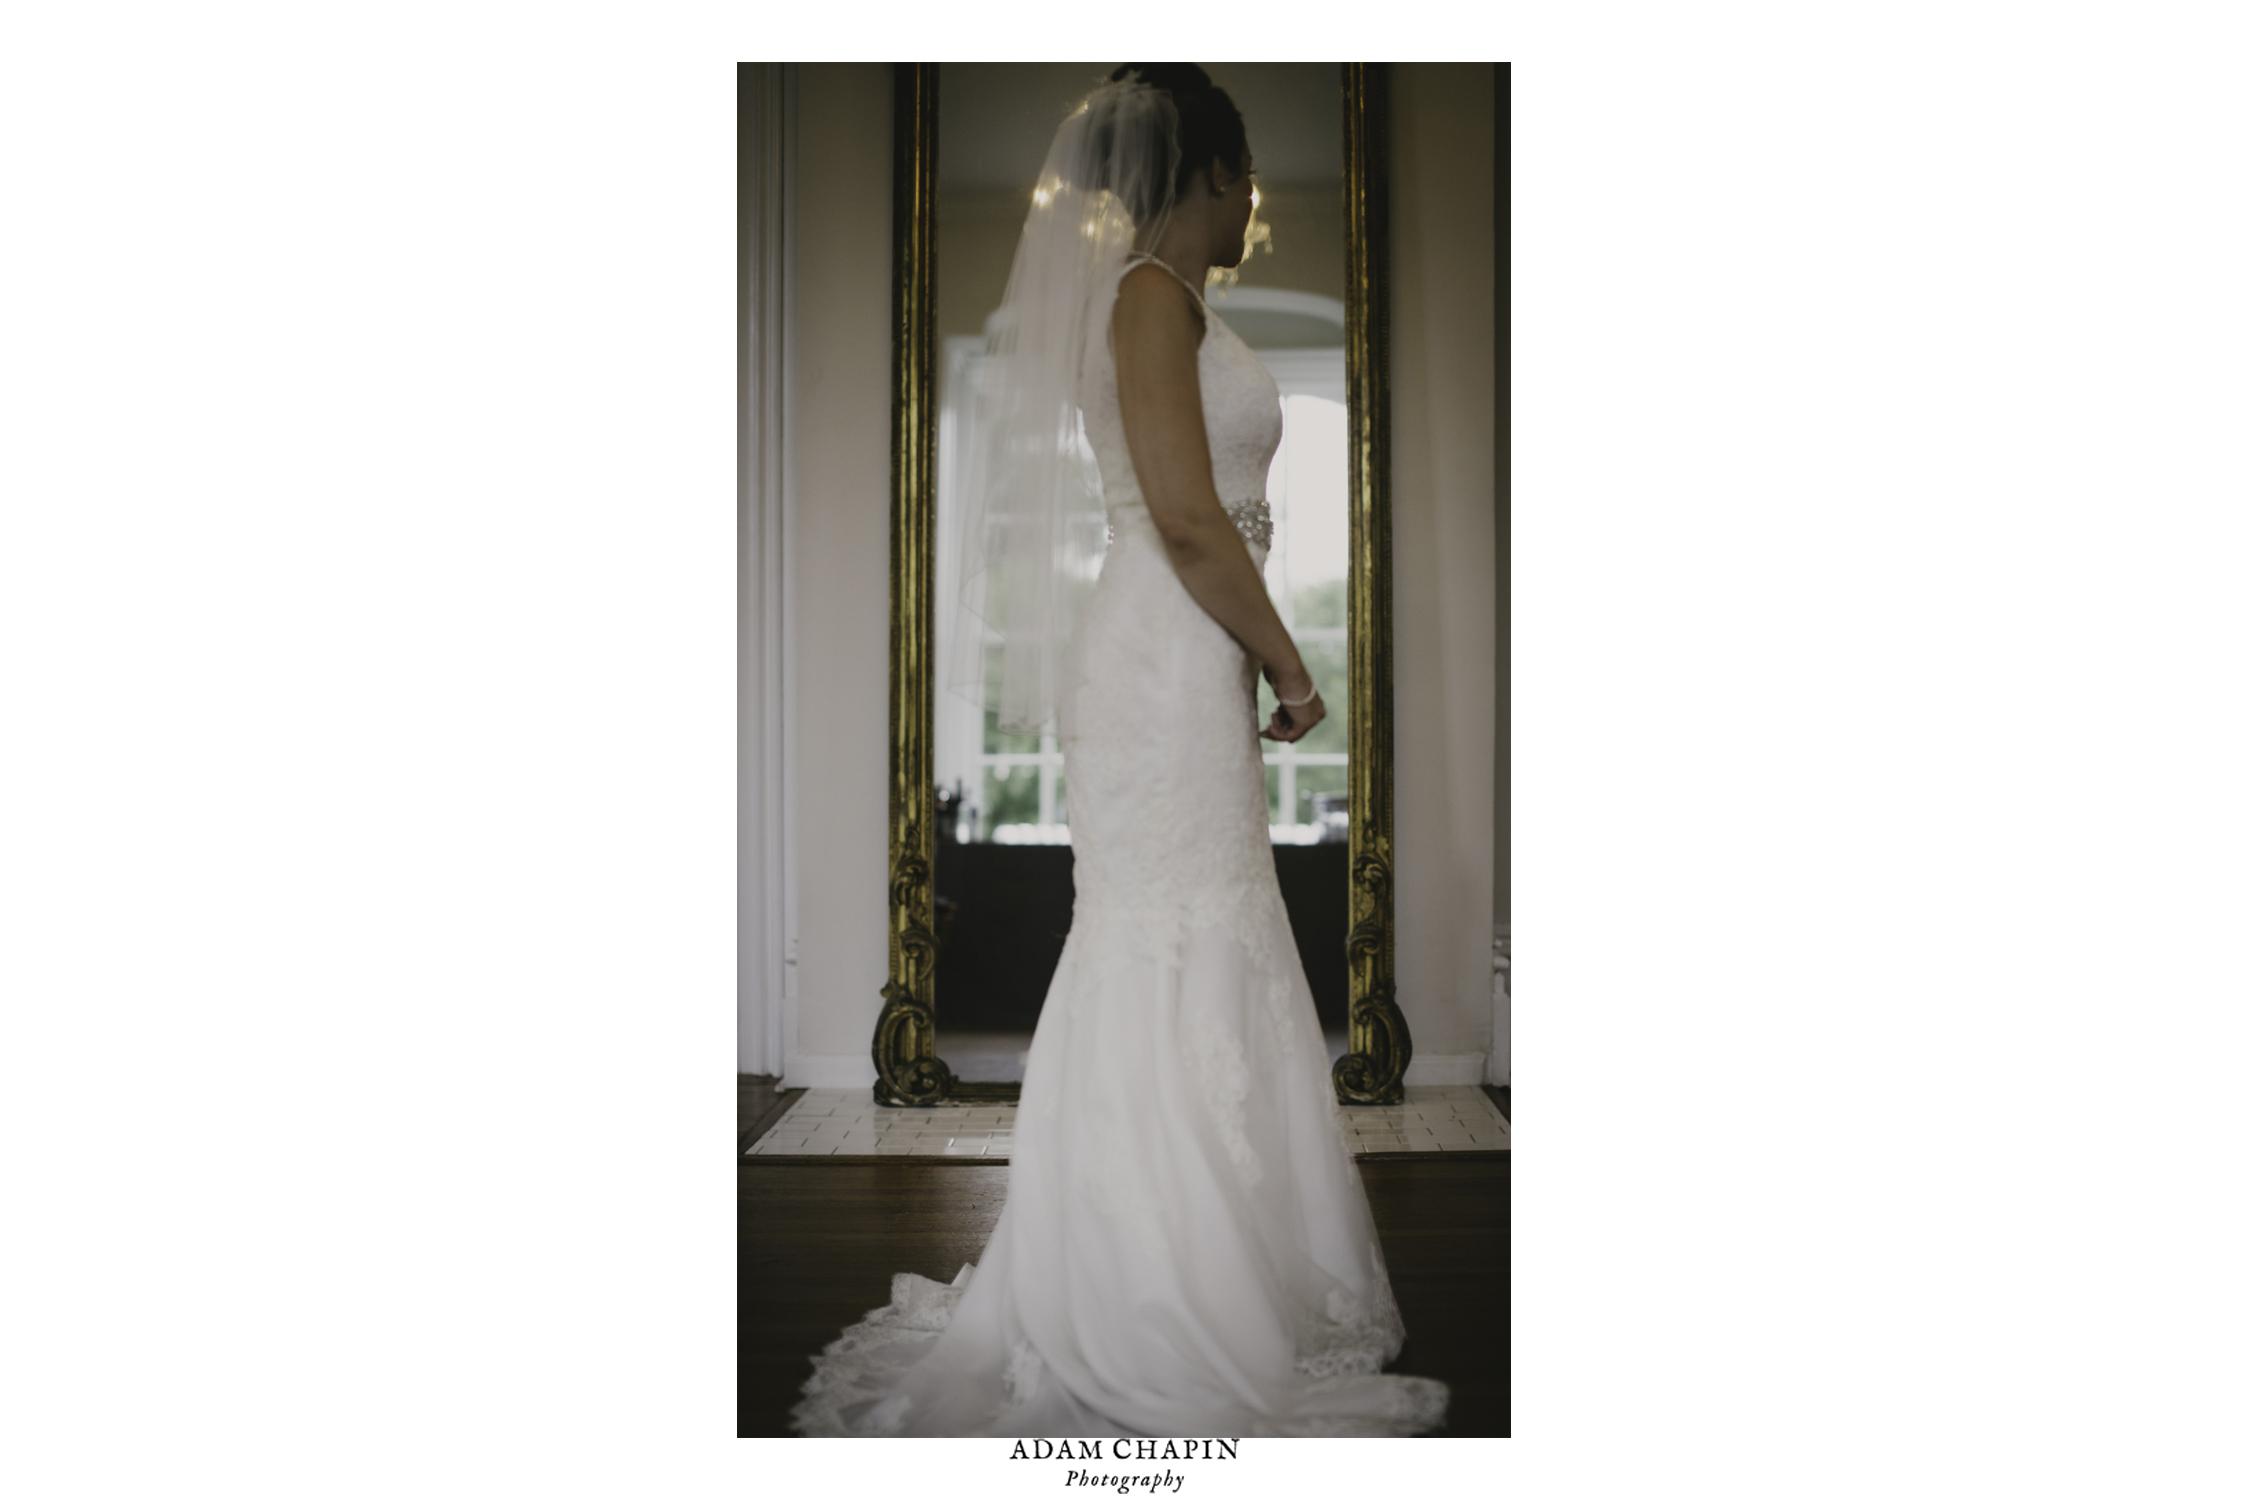 merrimon wynne first floor wedding dress